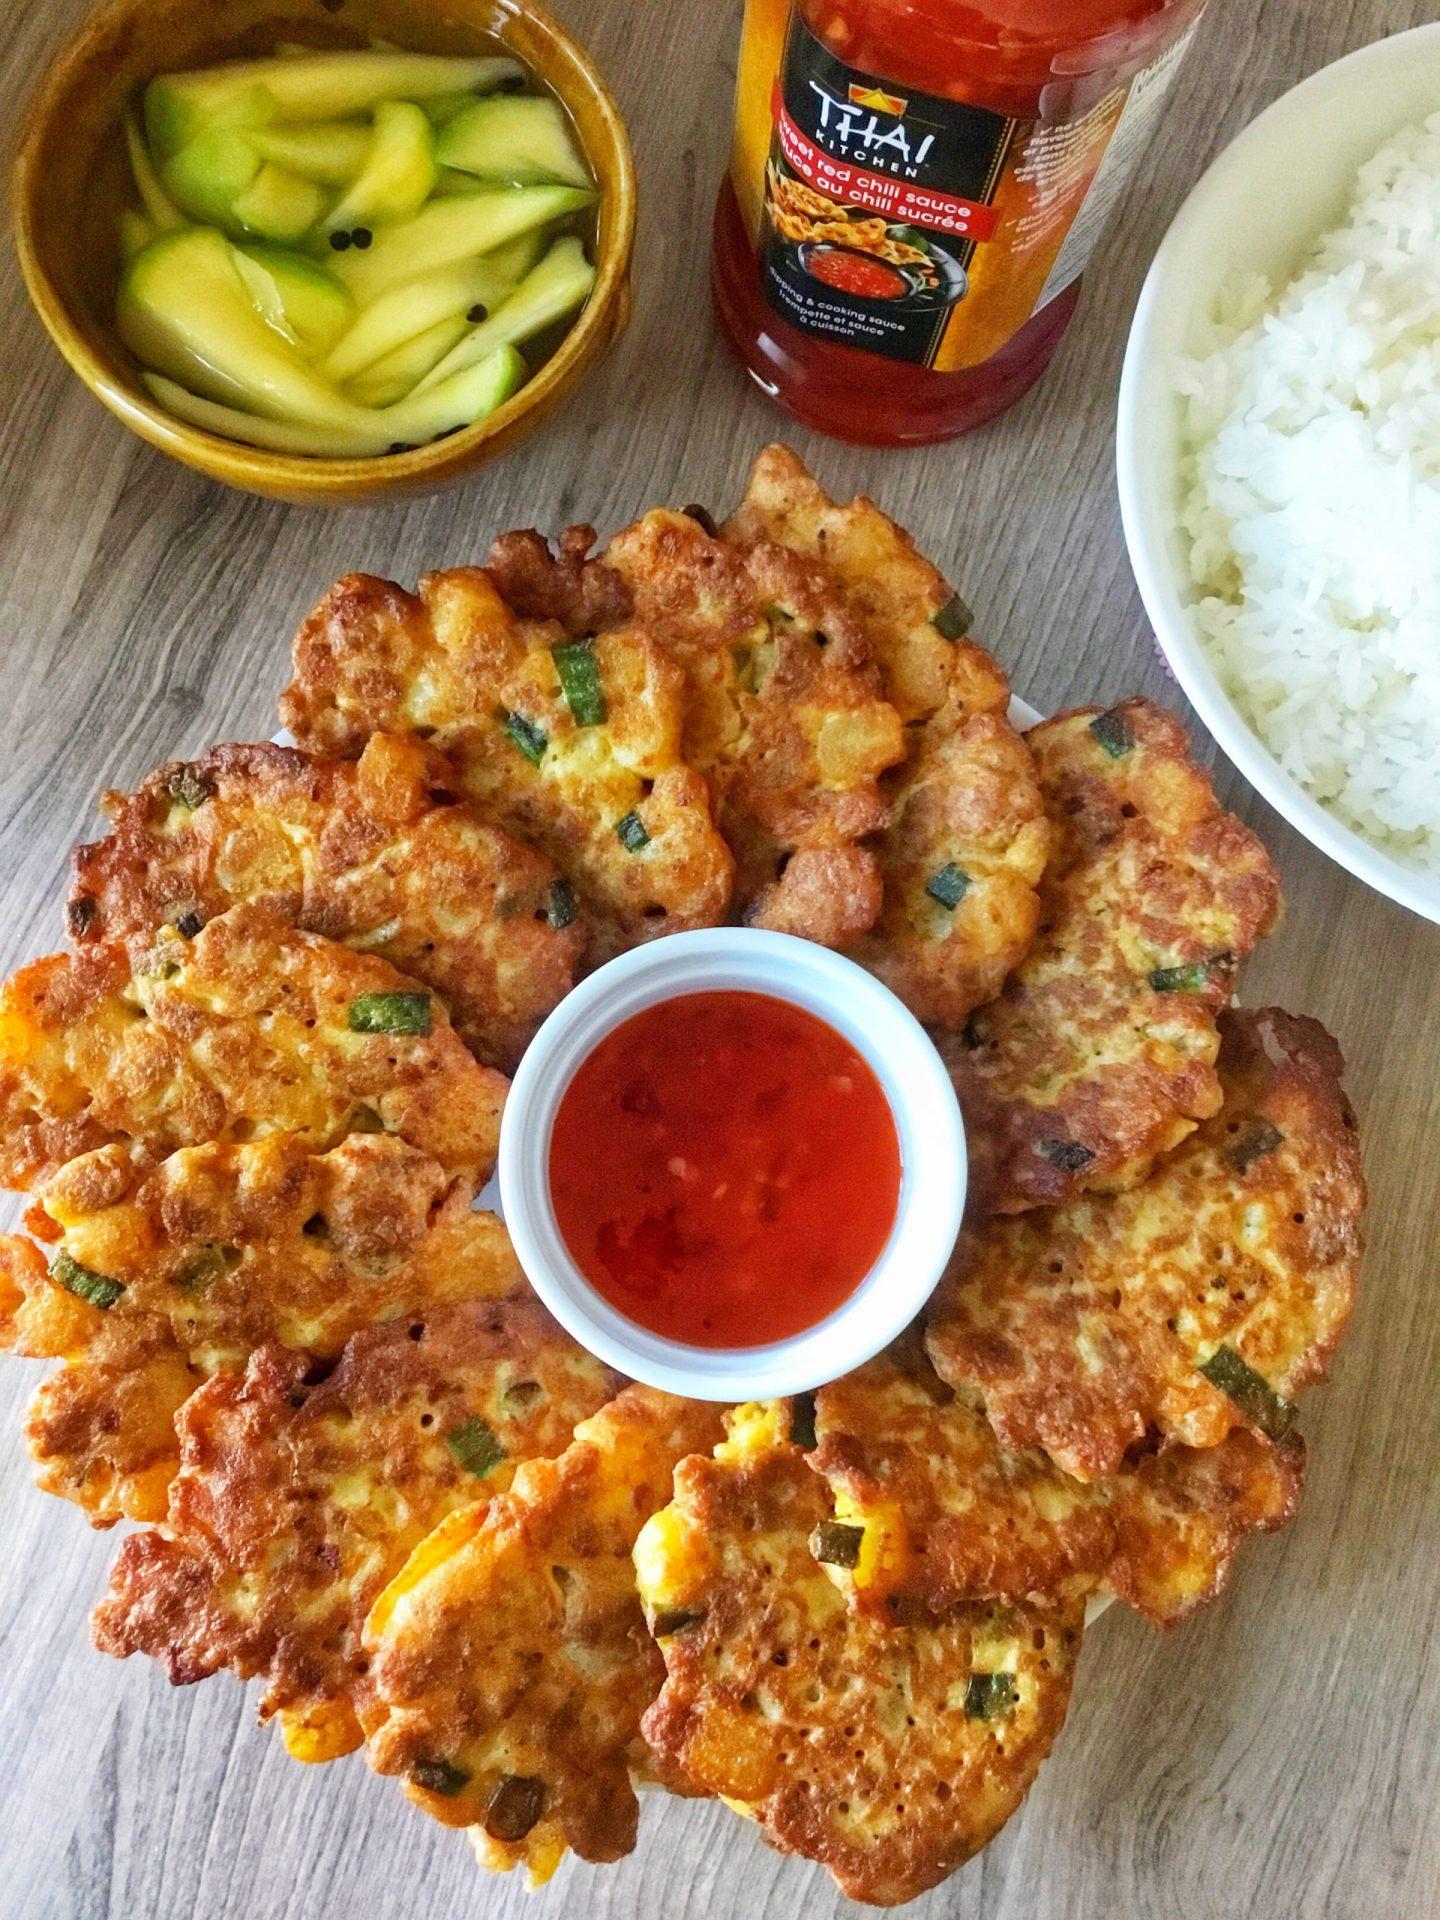 Pork and Potato Omelet (Tortang Giniling)